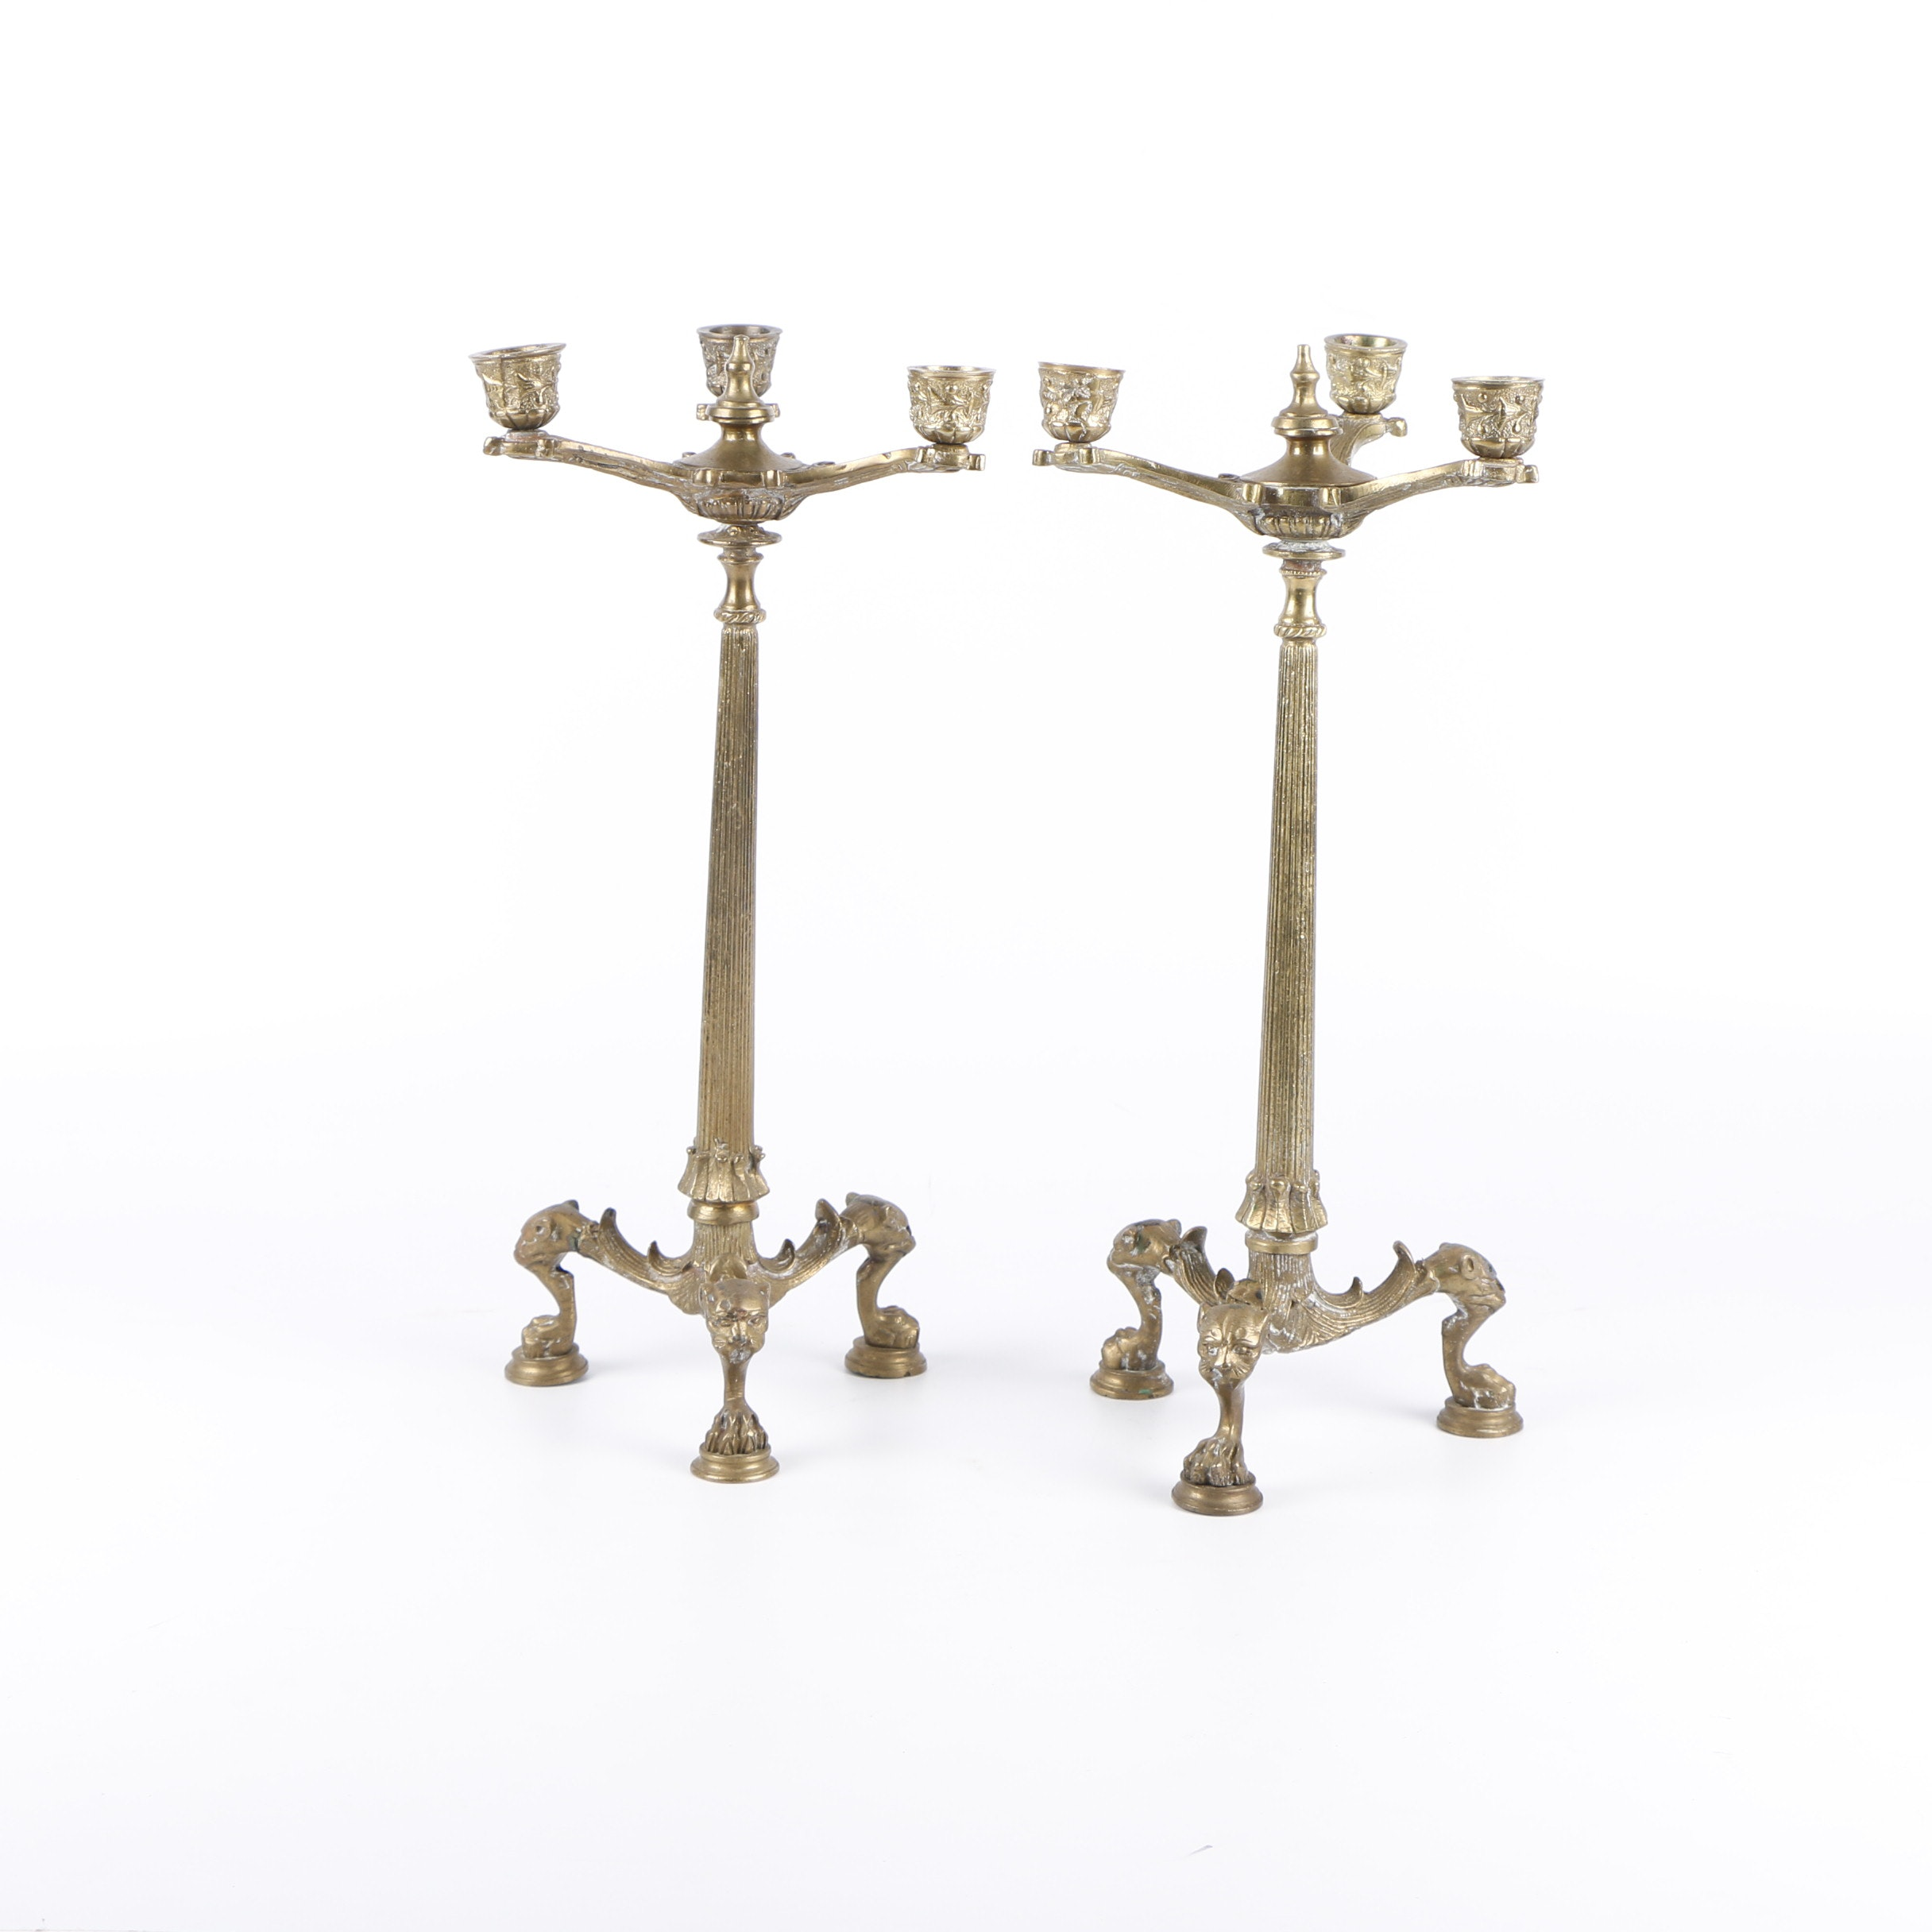 Handmade Indian Brass Candelabra with Figurative Feet